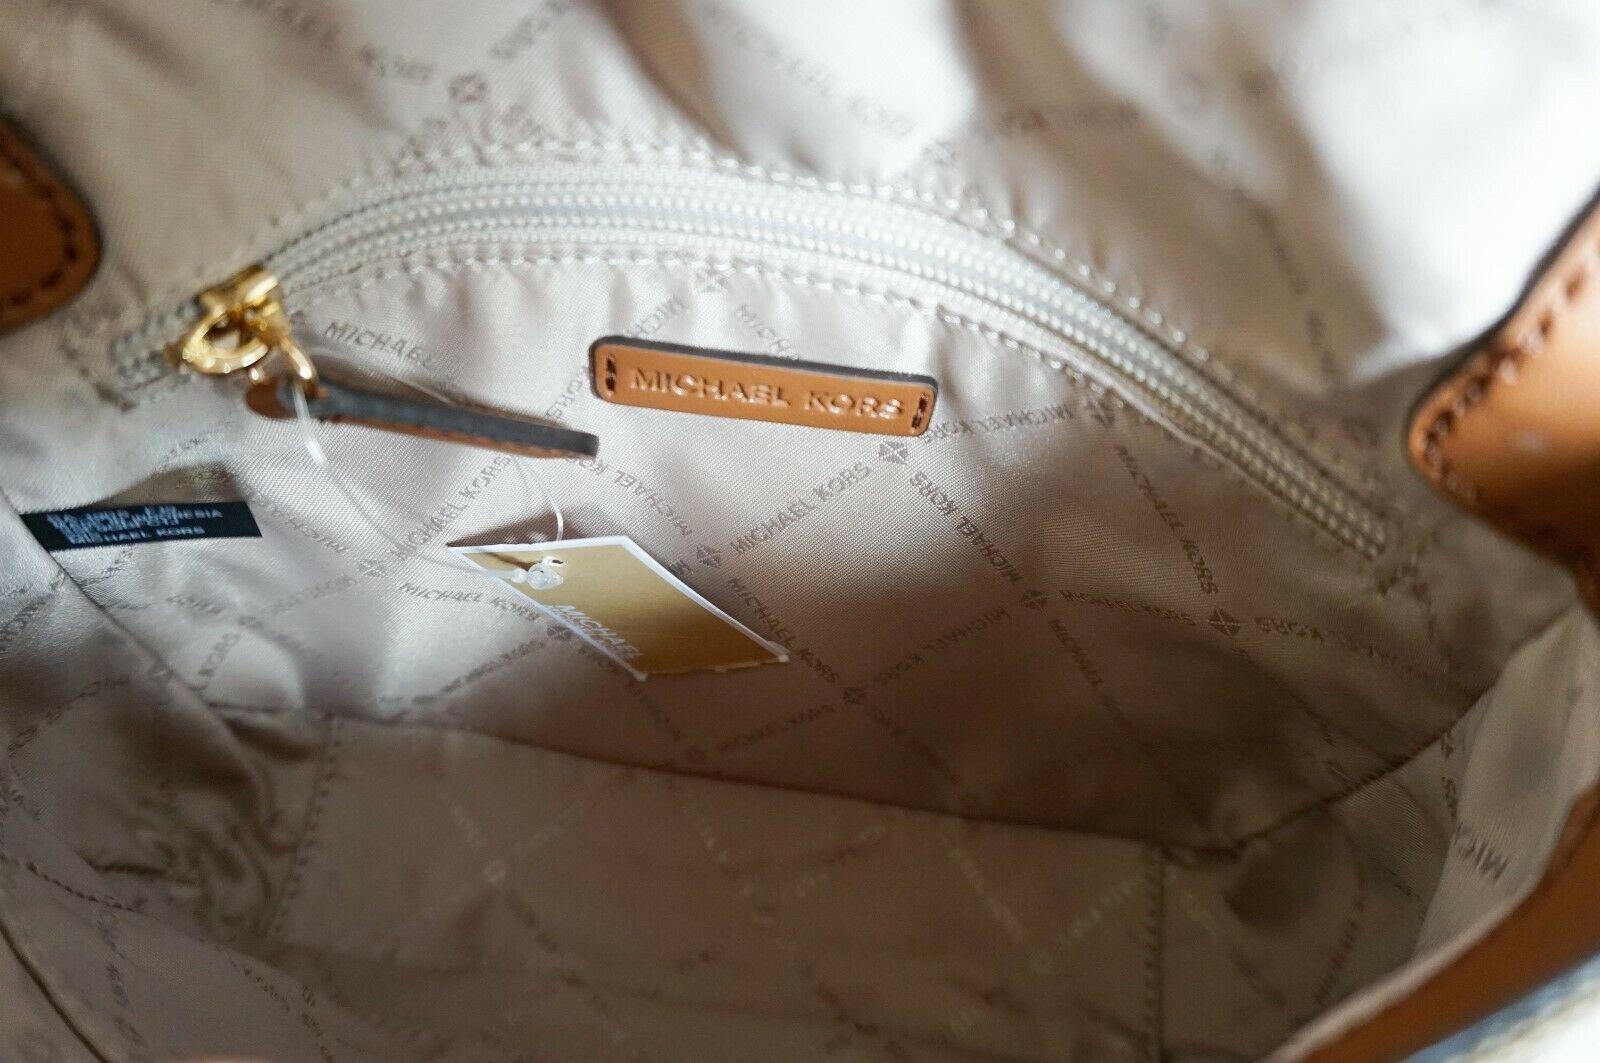 Michael Kors Bedford Small Flap Crossbody Jacquard Leaher Bag MK Beige Brown image 8